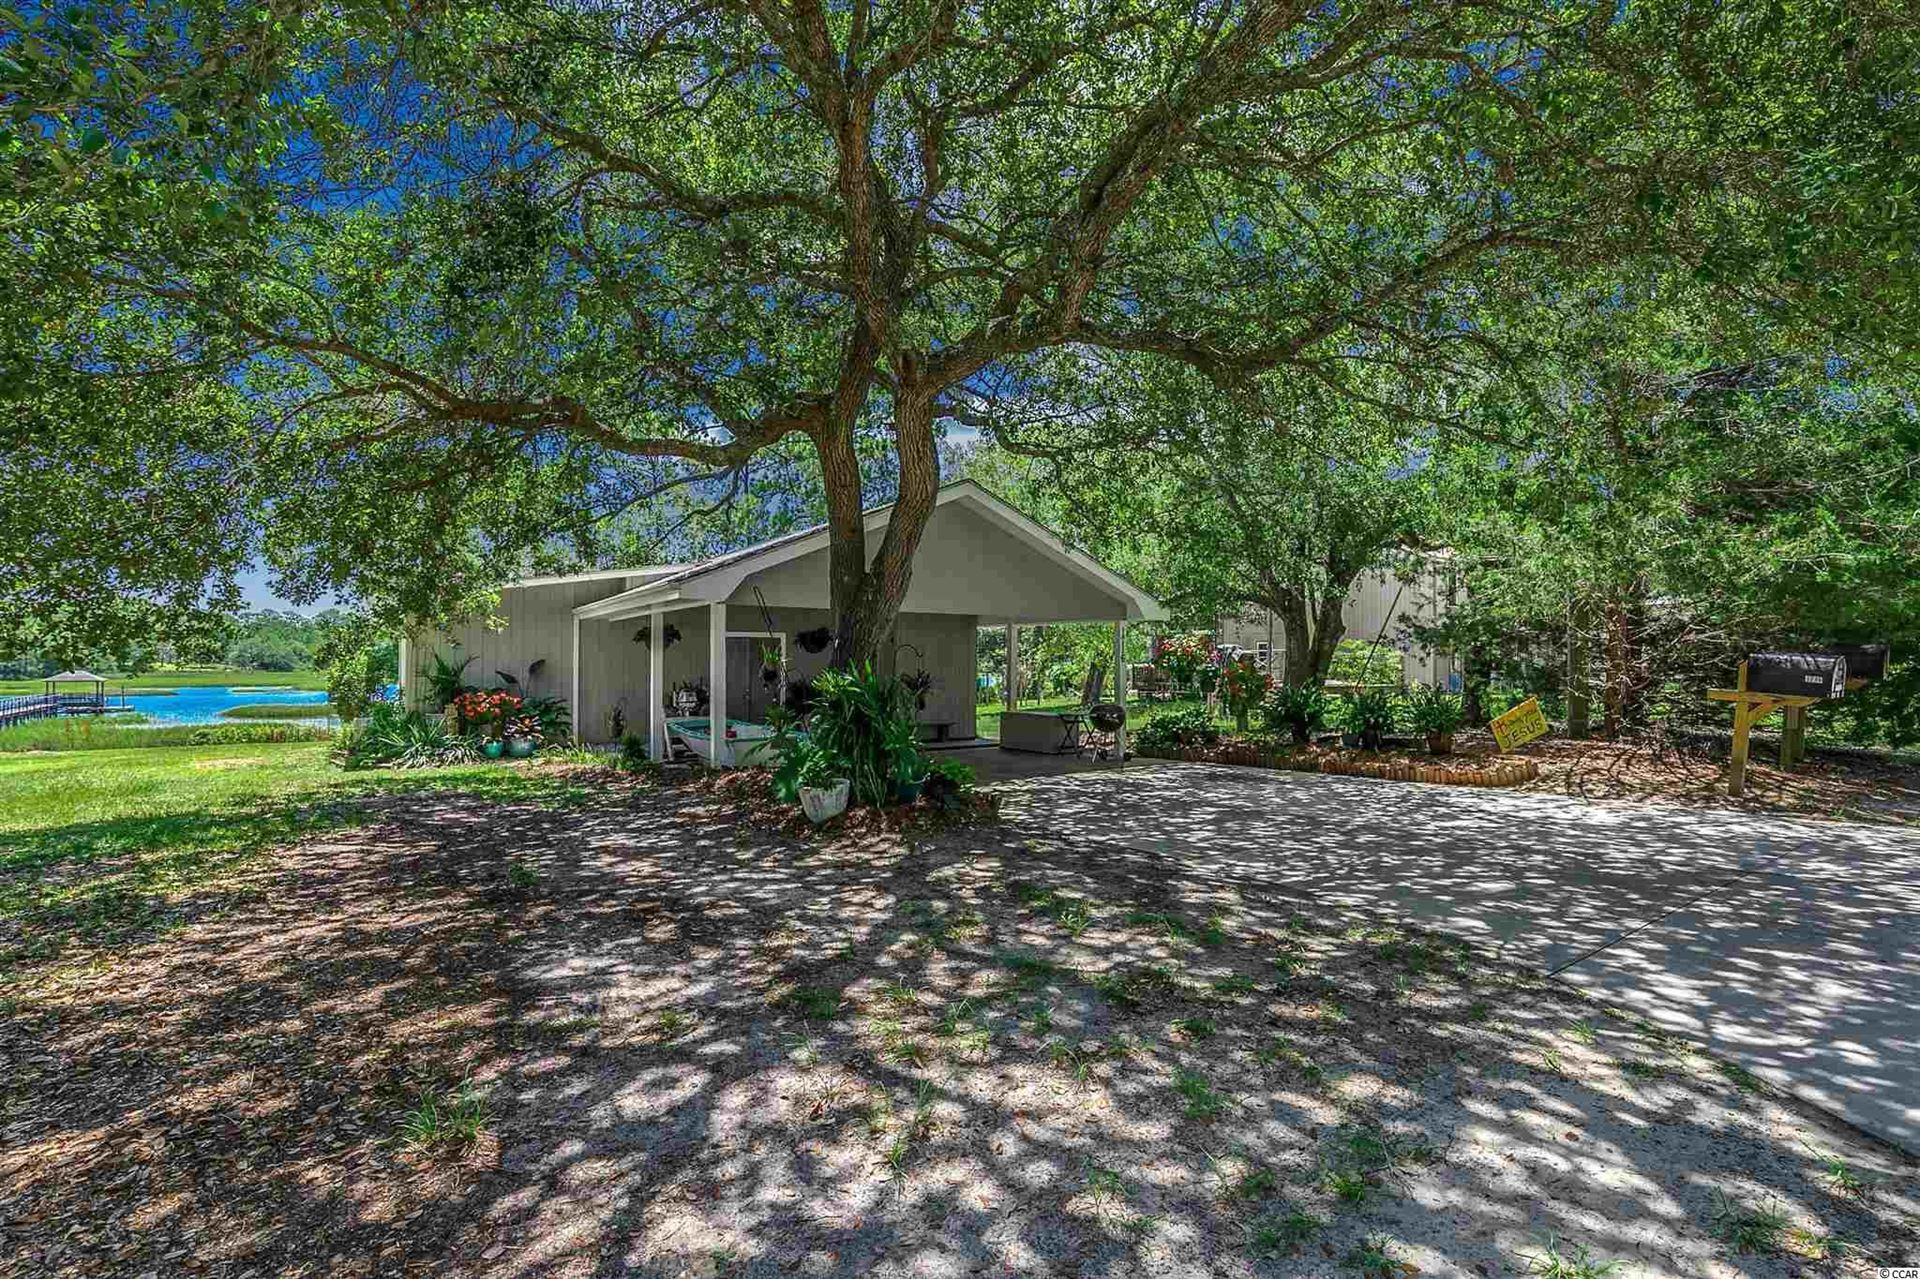 1716 Little Shallotte River Dr. SW, Shallotte, NC, 28470,  Home For Sale